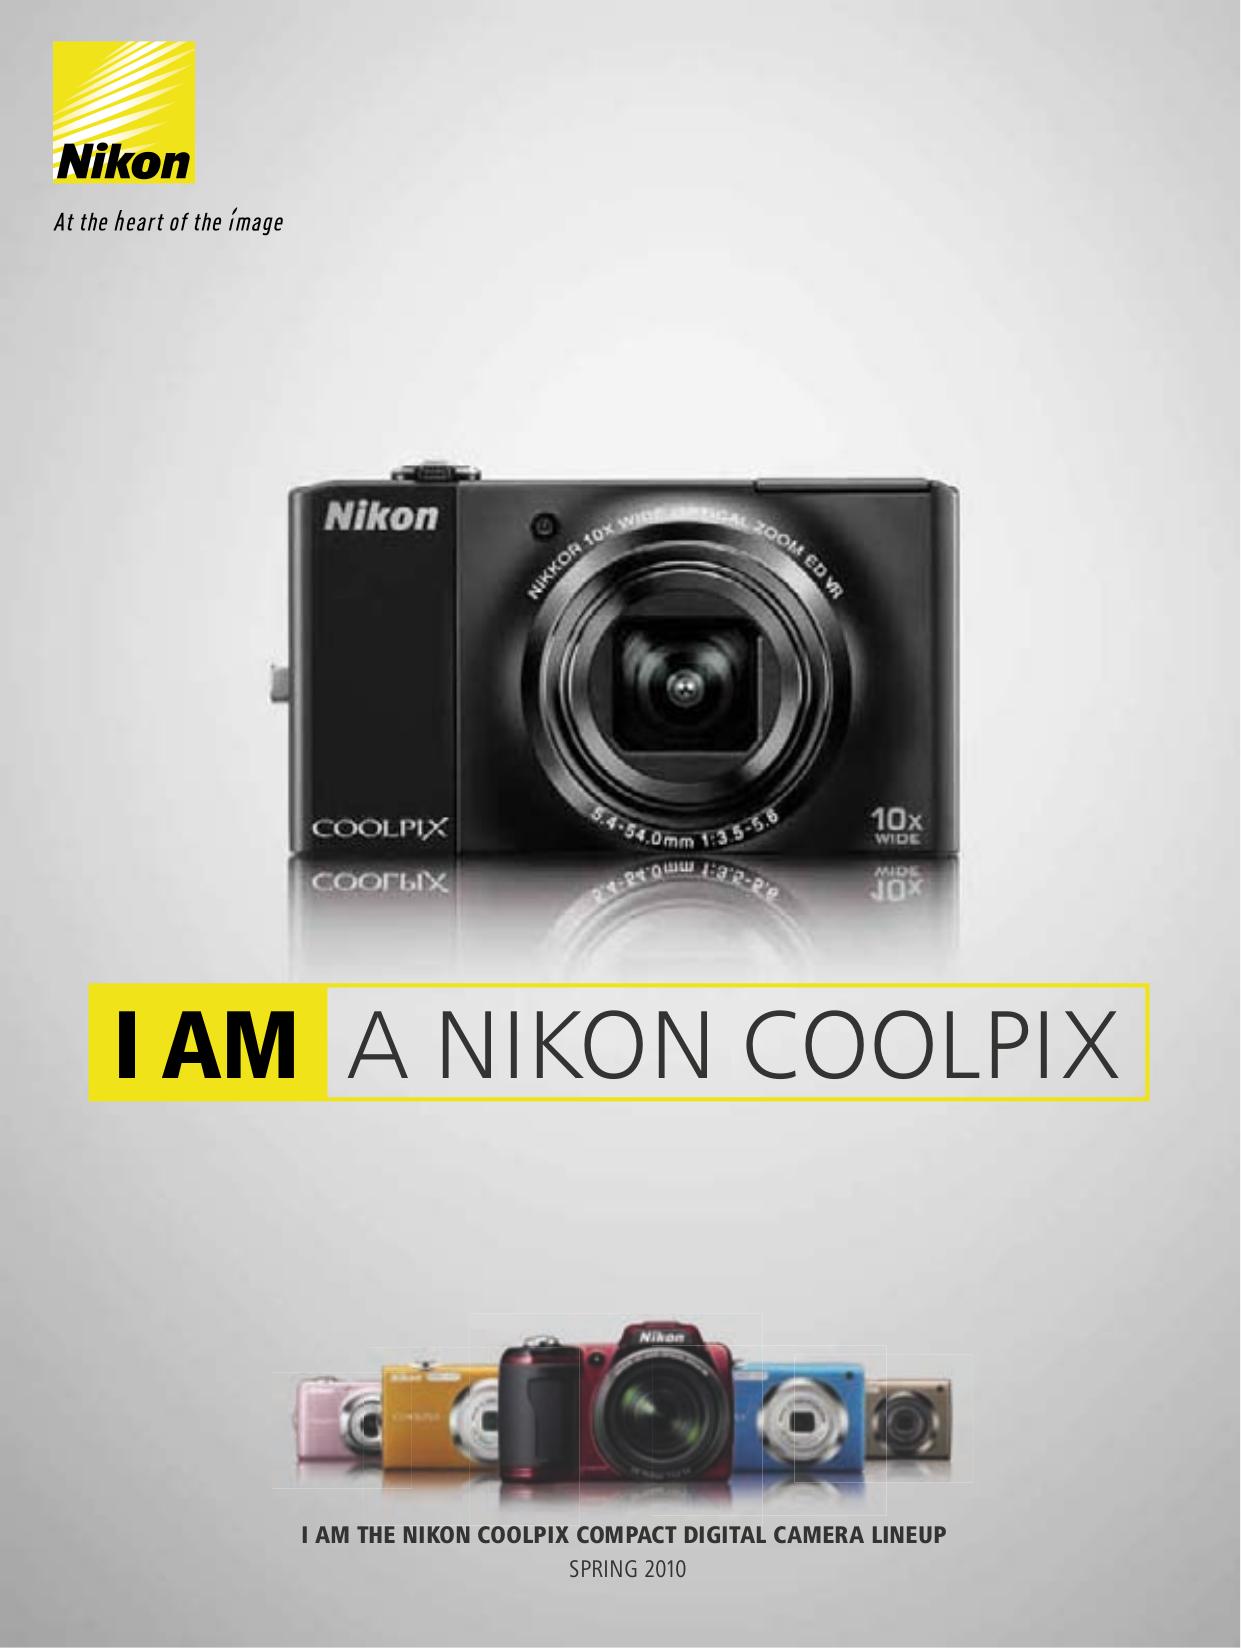 download free pdf for nikon coolpix s3000 digital camera nikon coolpix s3000 owners manual nikon coolpix s3000 manual download